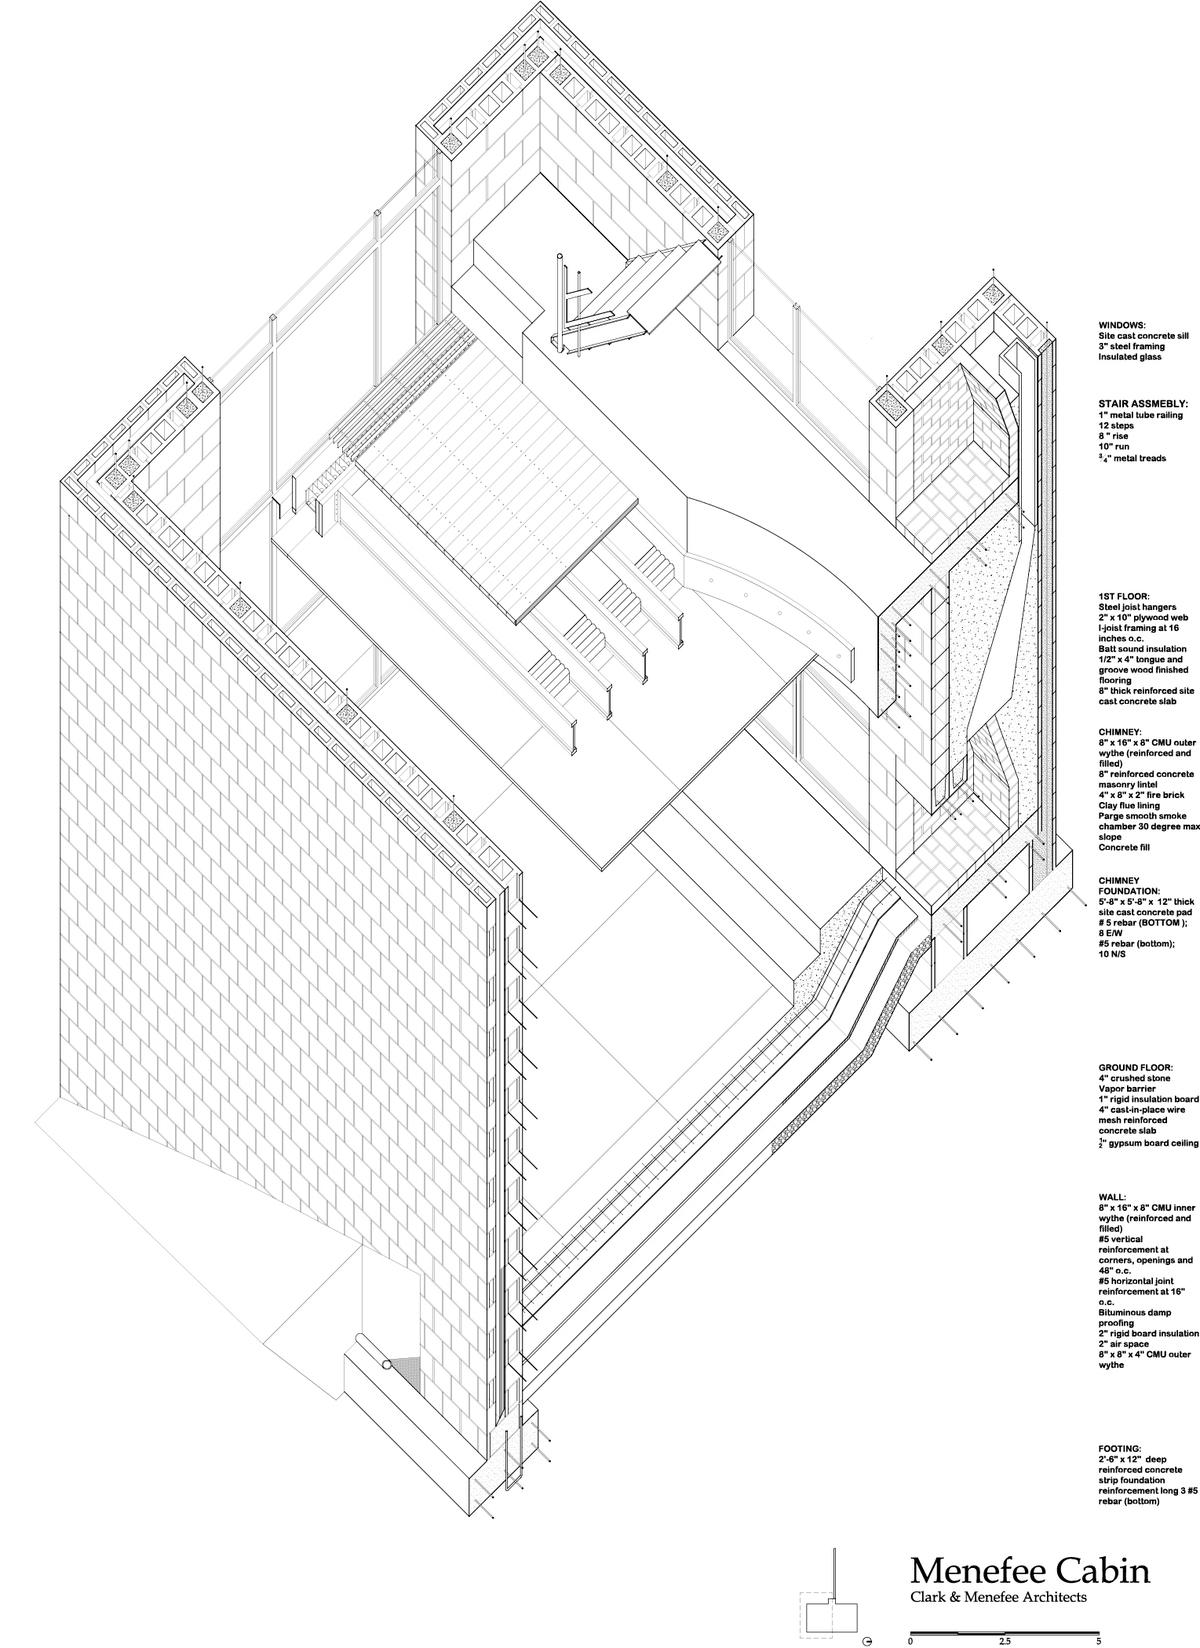 Autocad drawing - Meneffee Cabin